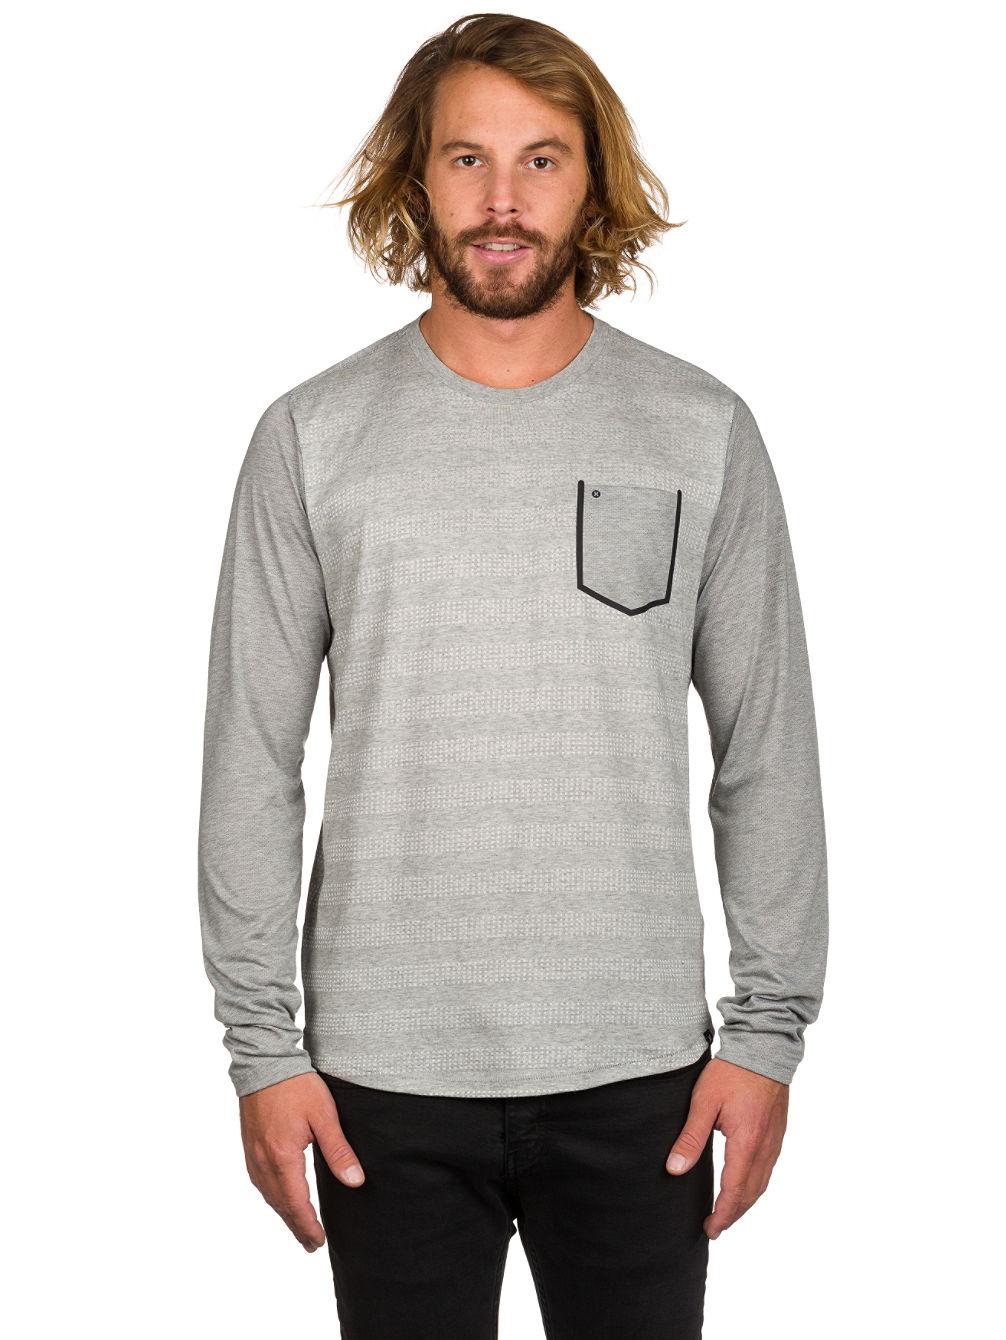 hurley-dri-fit-flow-20-crew-t-shirt-ls